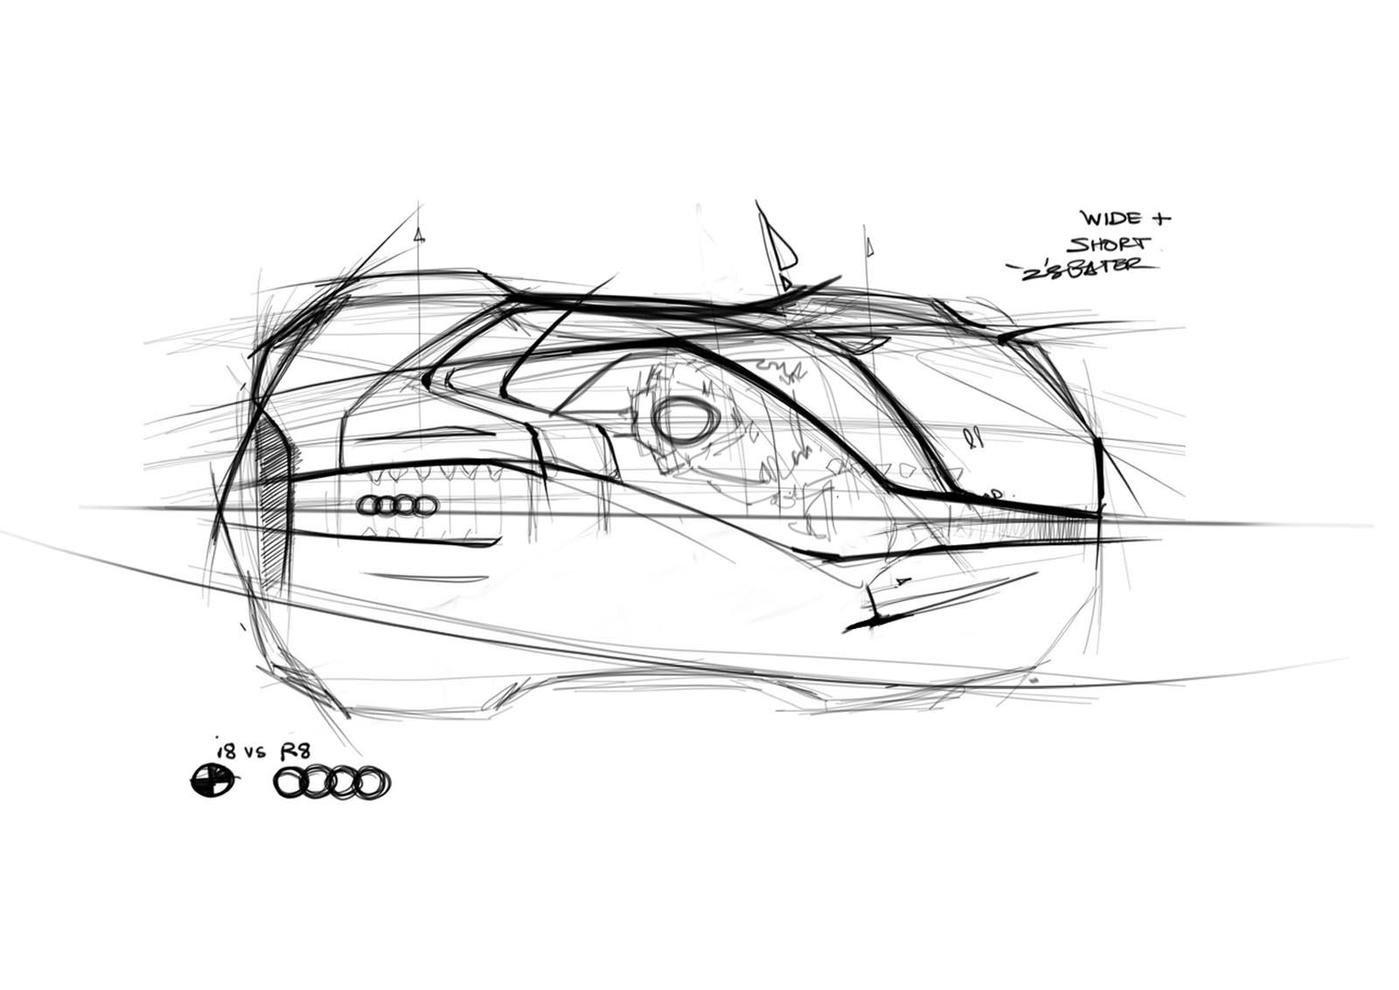 Sketchbook 2012 by ARUNKUMAR FRANCIS at Coroflot.com